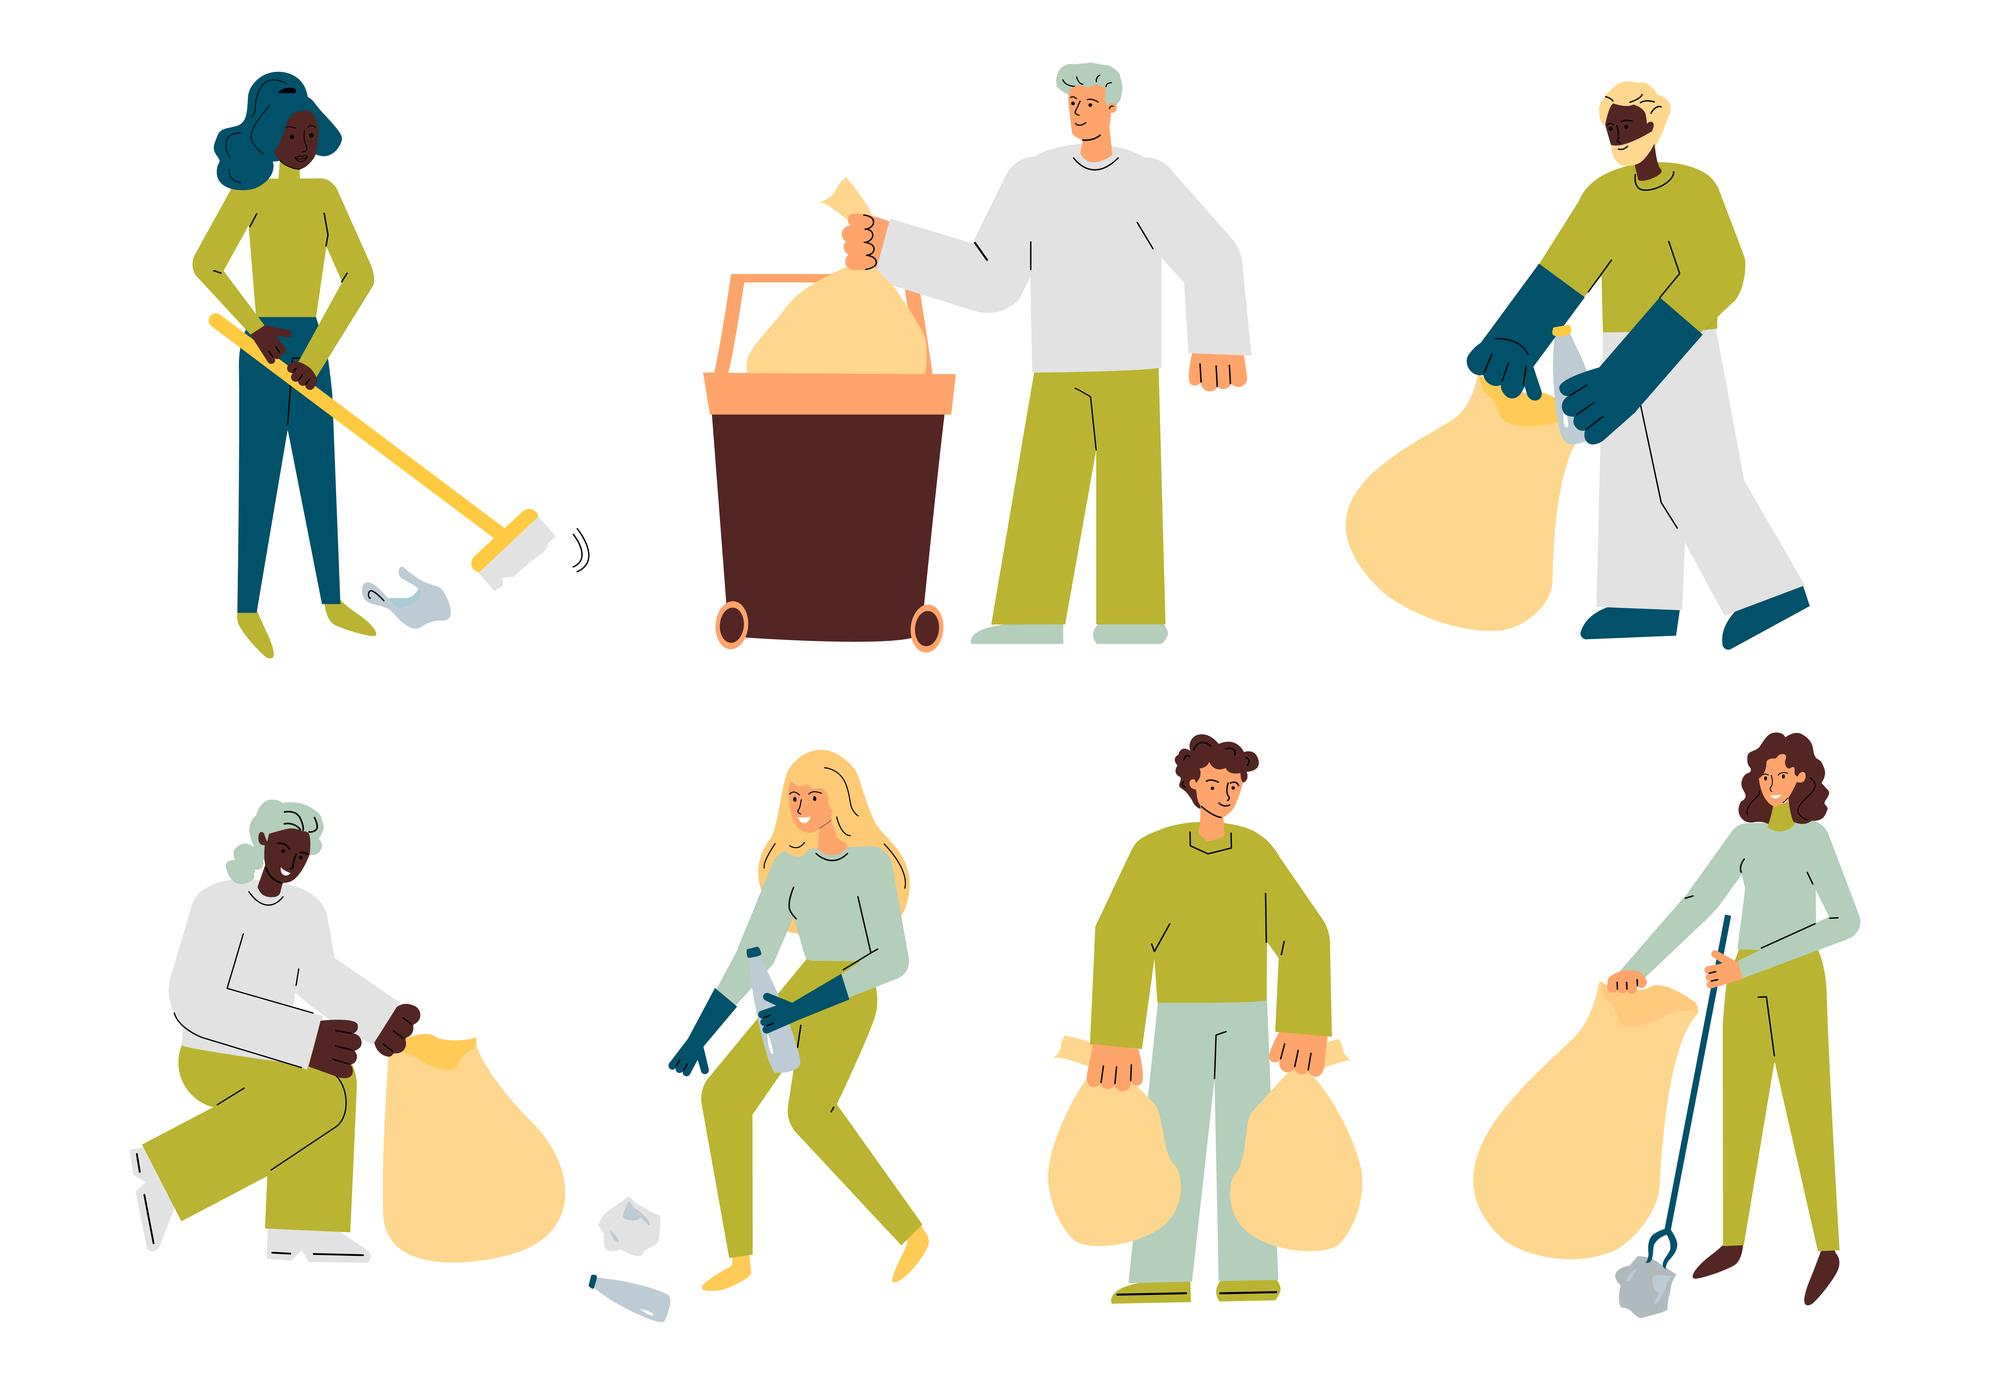 Images of volunteers picking up trash